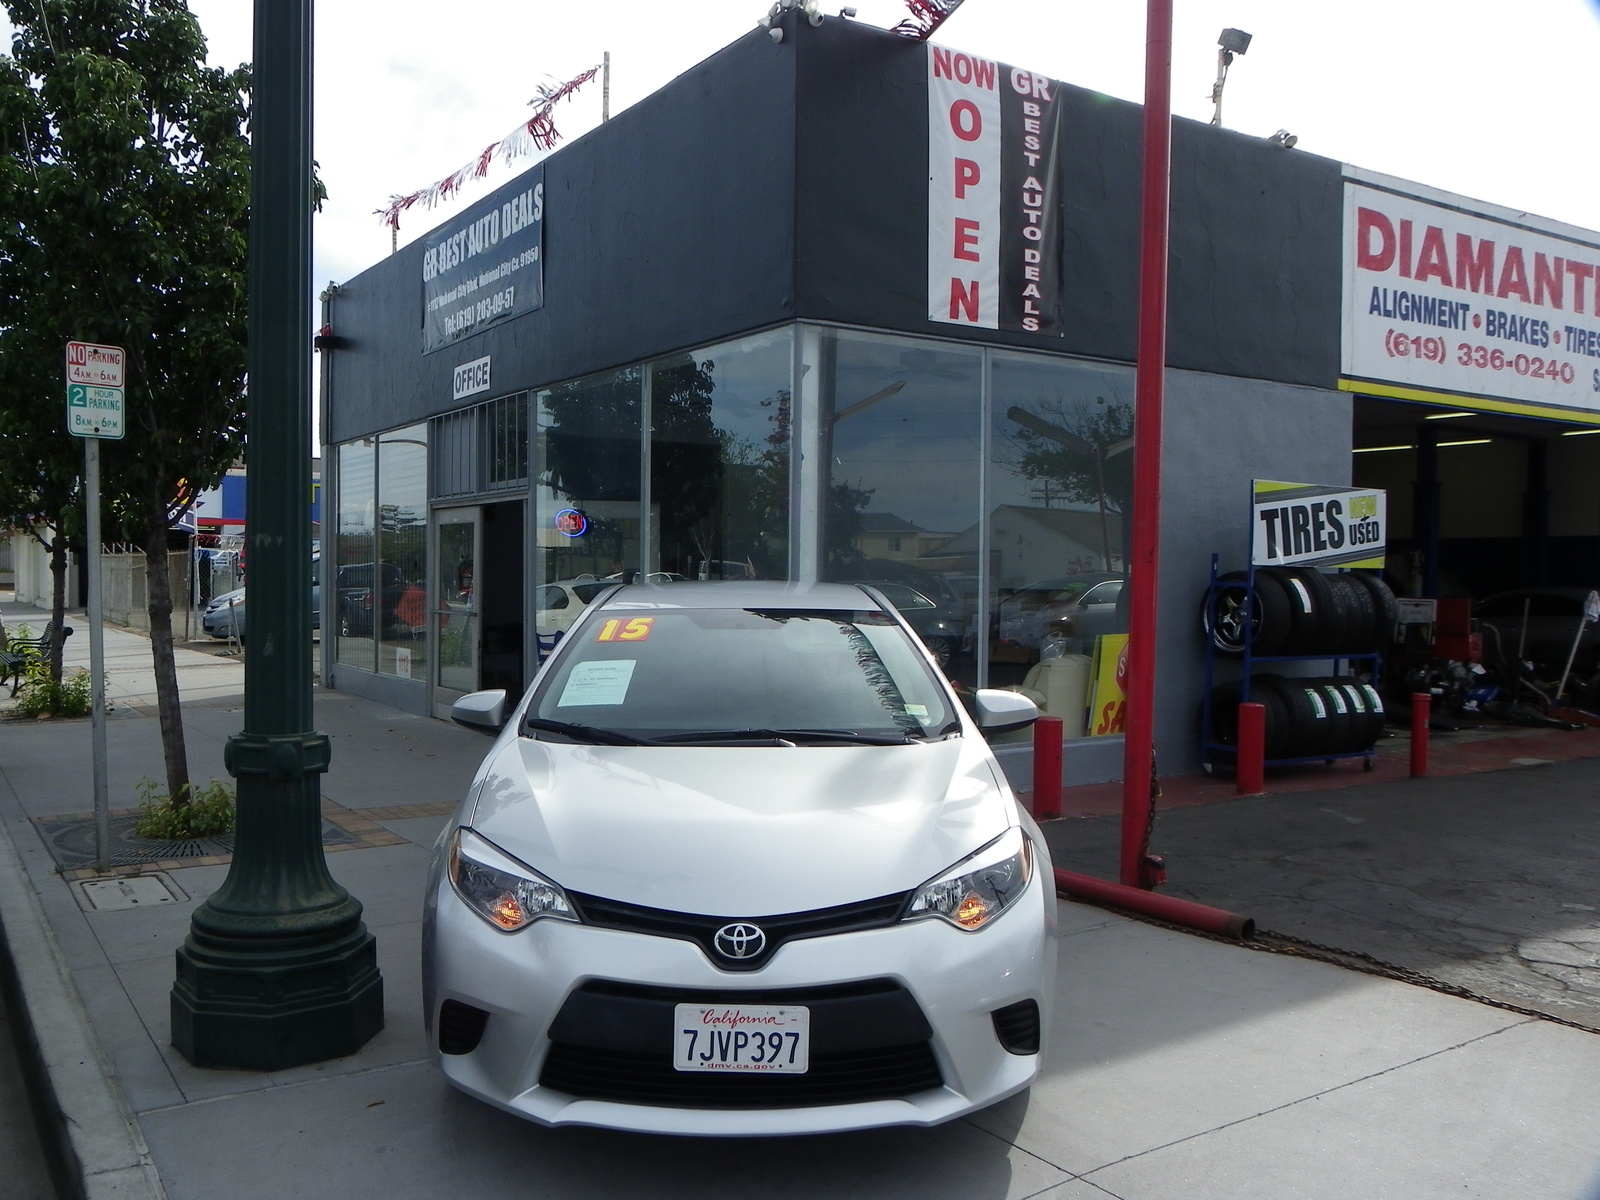 Best Auto Deals >> Gr Best Auto Deals National City Ca Read Consumer Reviews